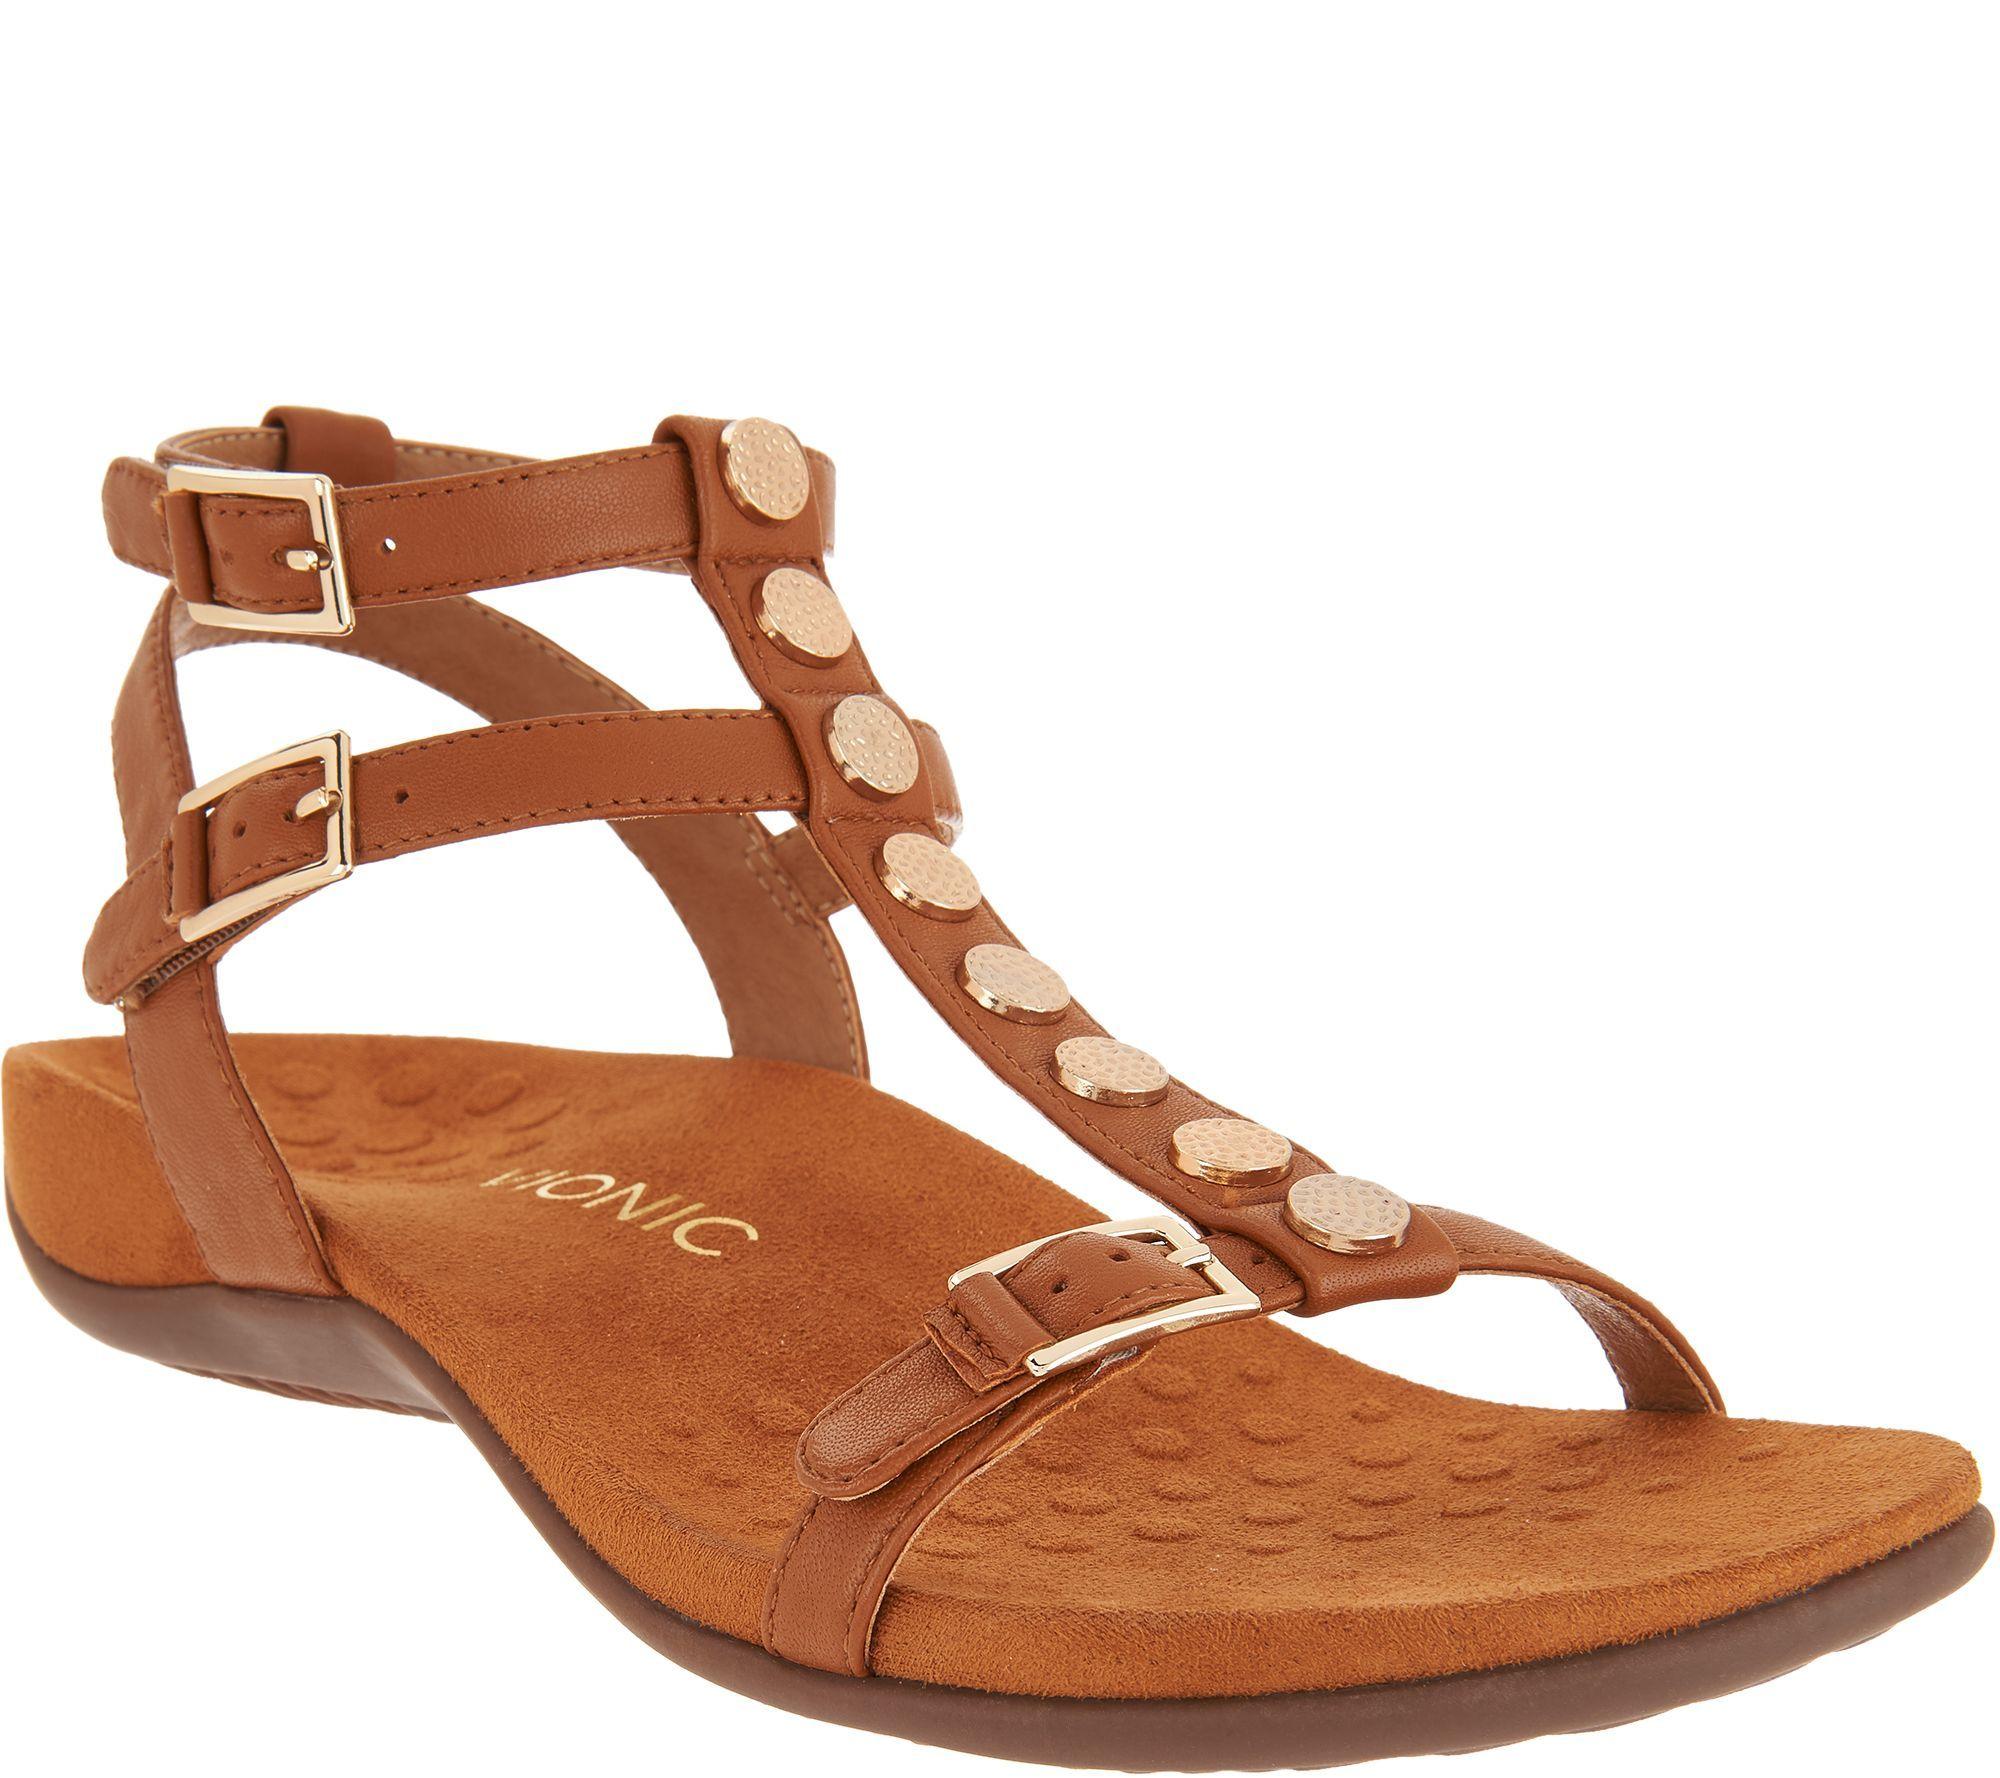 bffa5373a425 Vionic Leather Multi-Strap Sandals - Hailey — QVC.com